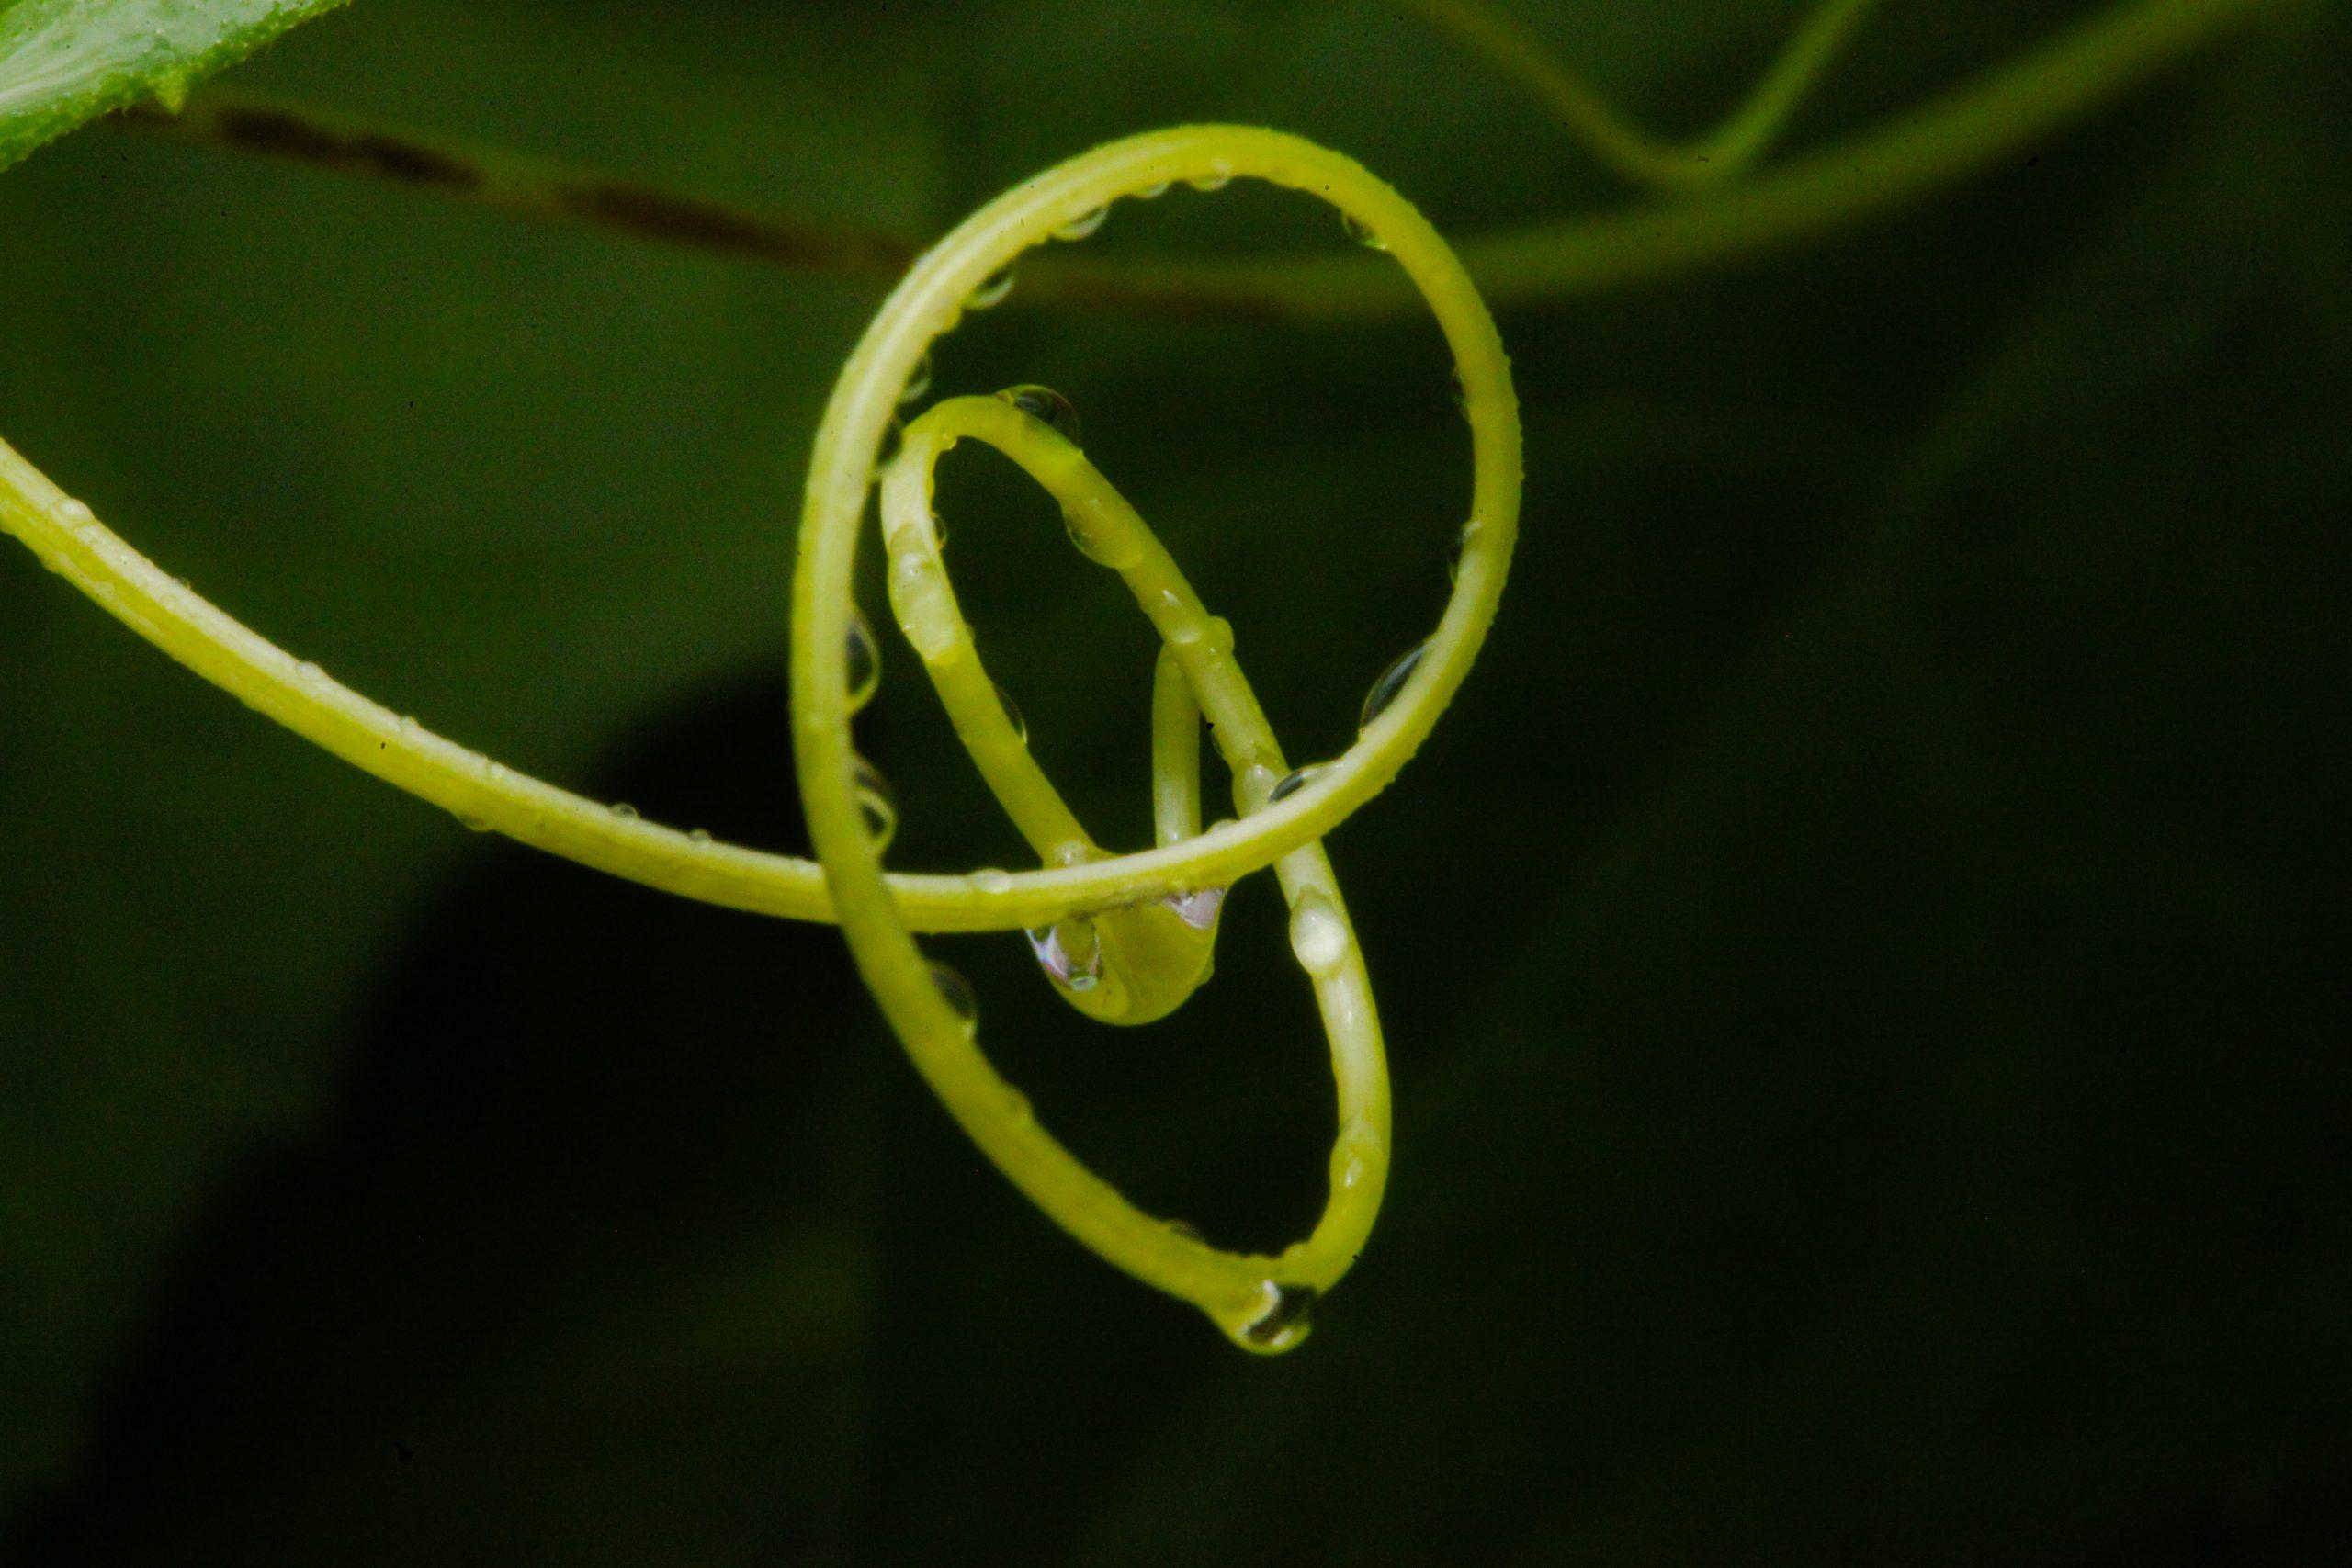 Water drop on a vine